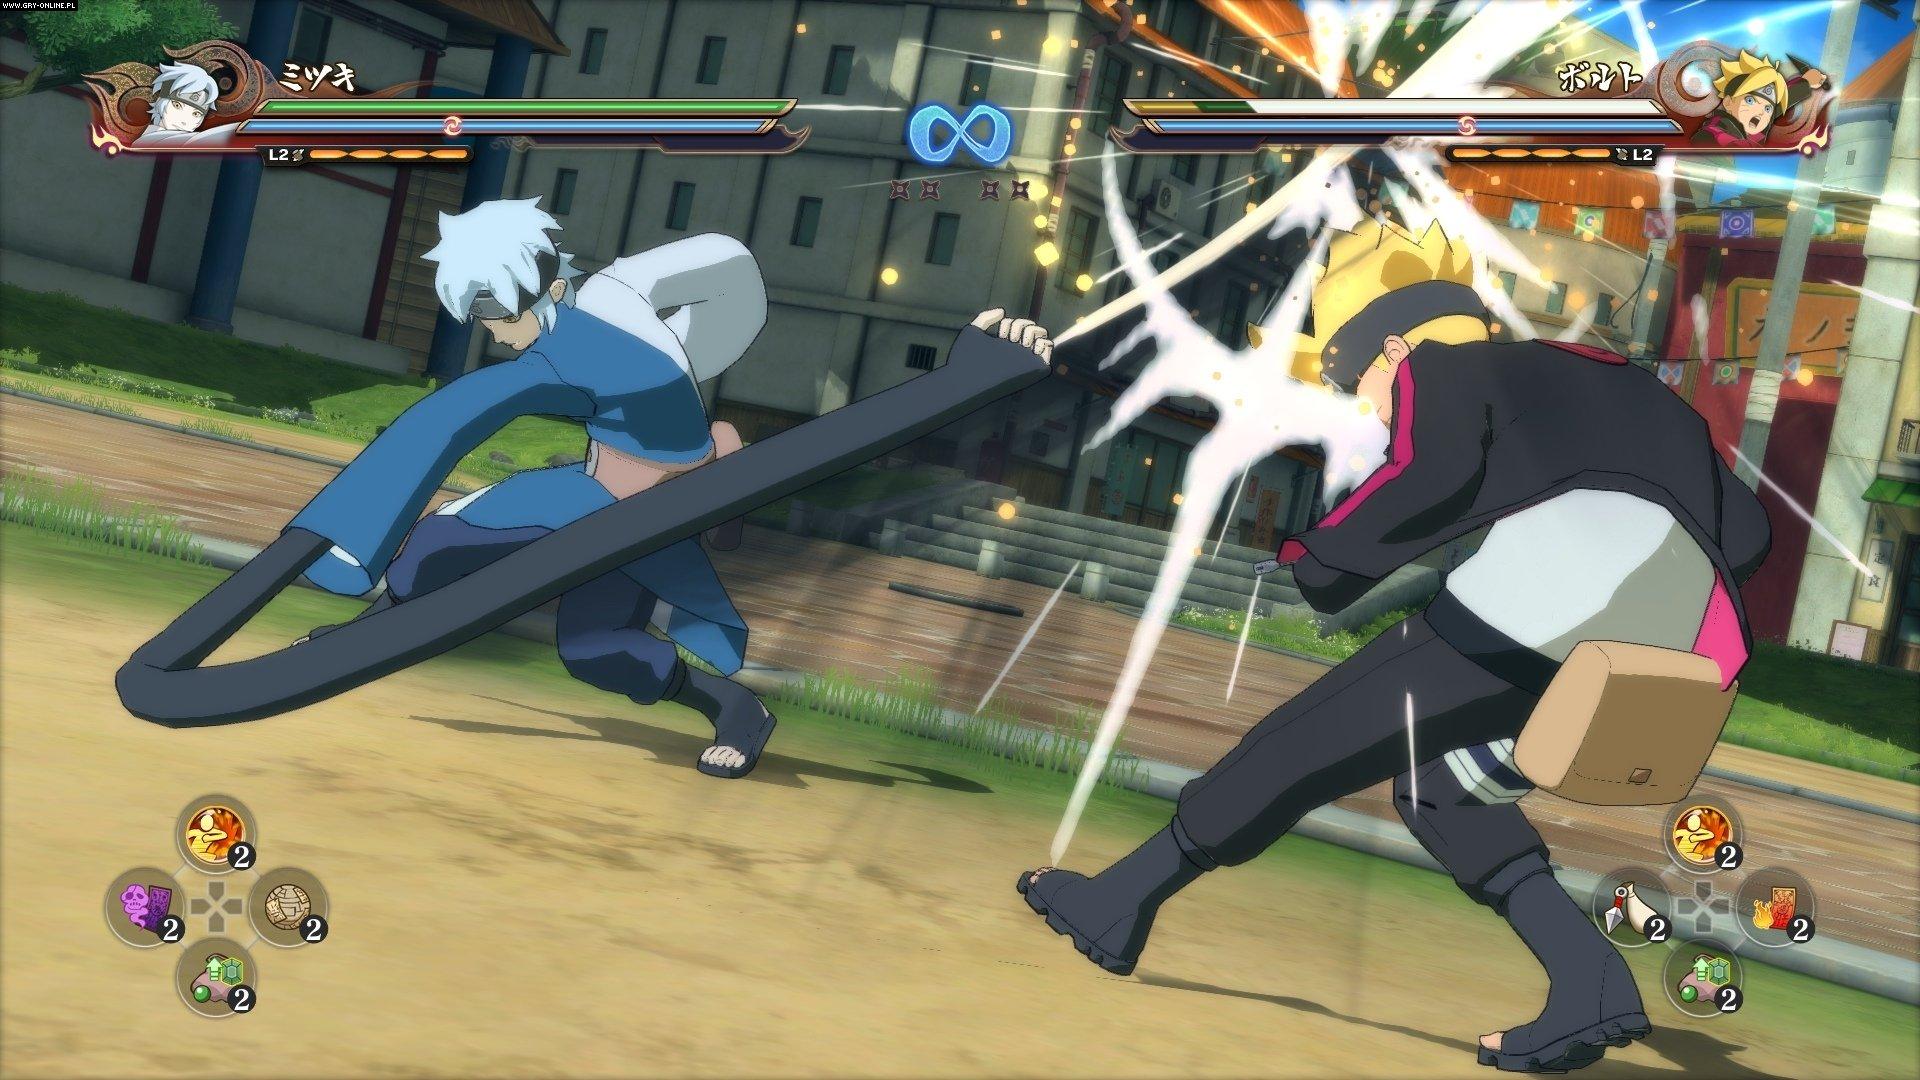 Naruto Shippuden: Ultimate Ninja Storm 4 - Road to Boruto PC, XONE, PS4 Games Image 29/29, Cyberconnect2, Bandai Namco Entertainment